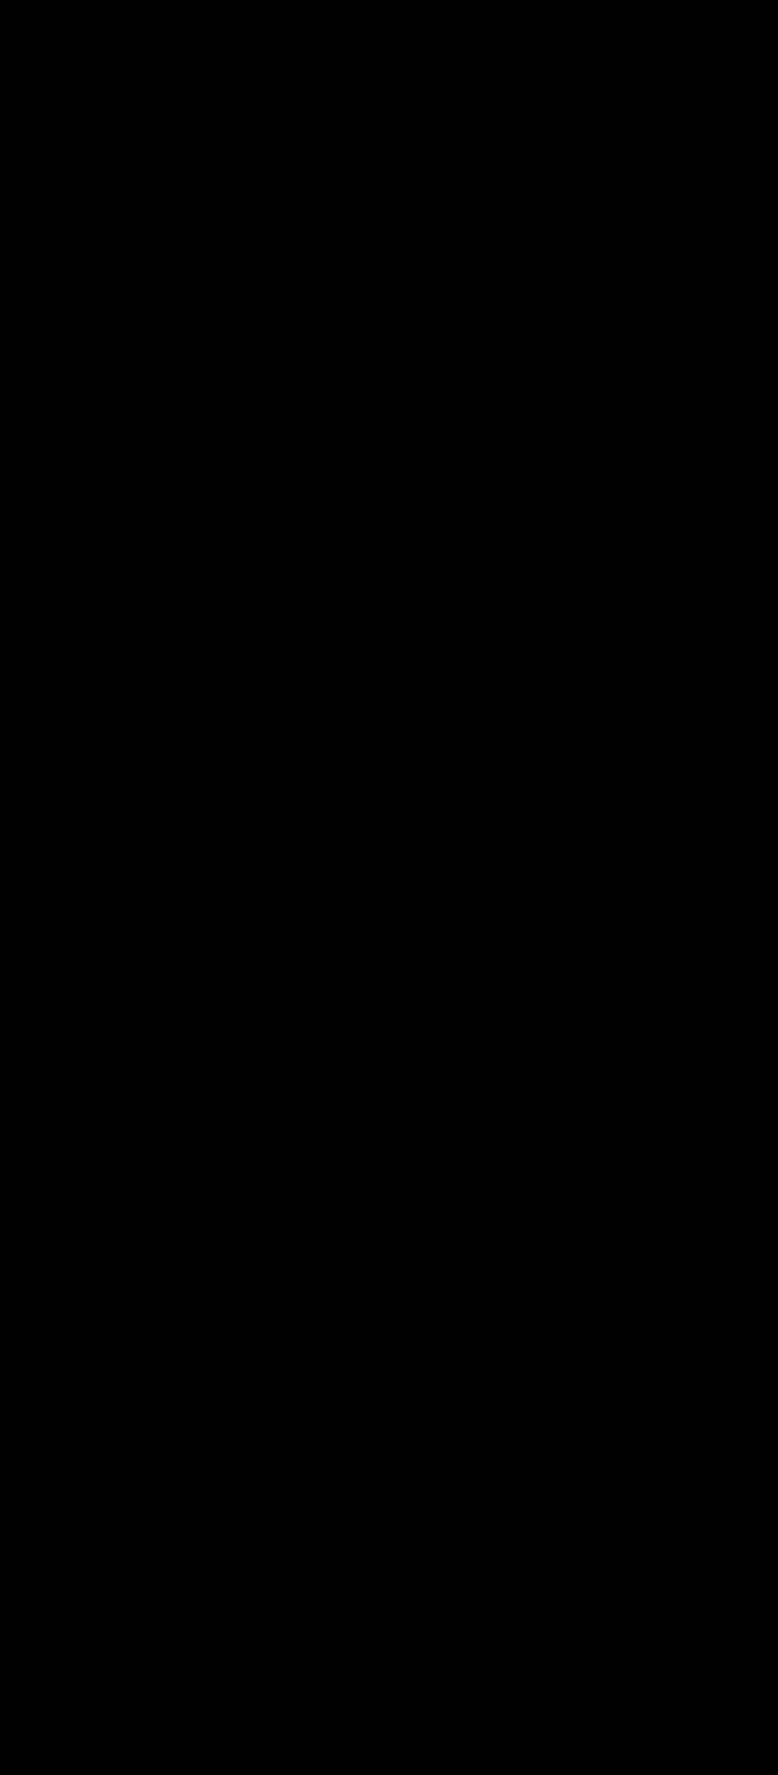 Telephone clipart illustration. Lacrosse free clipartmonk clip